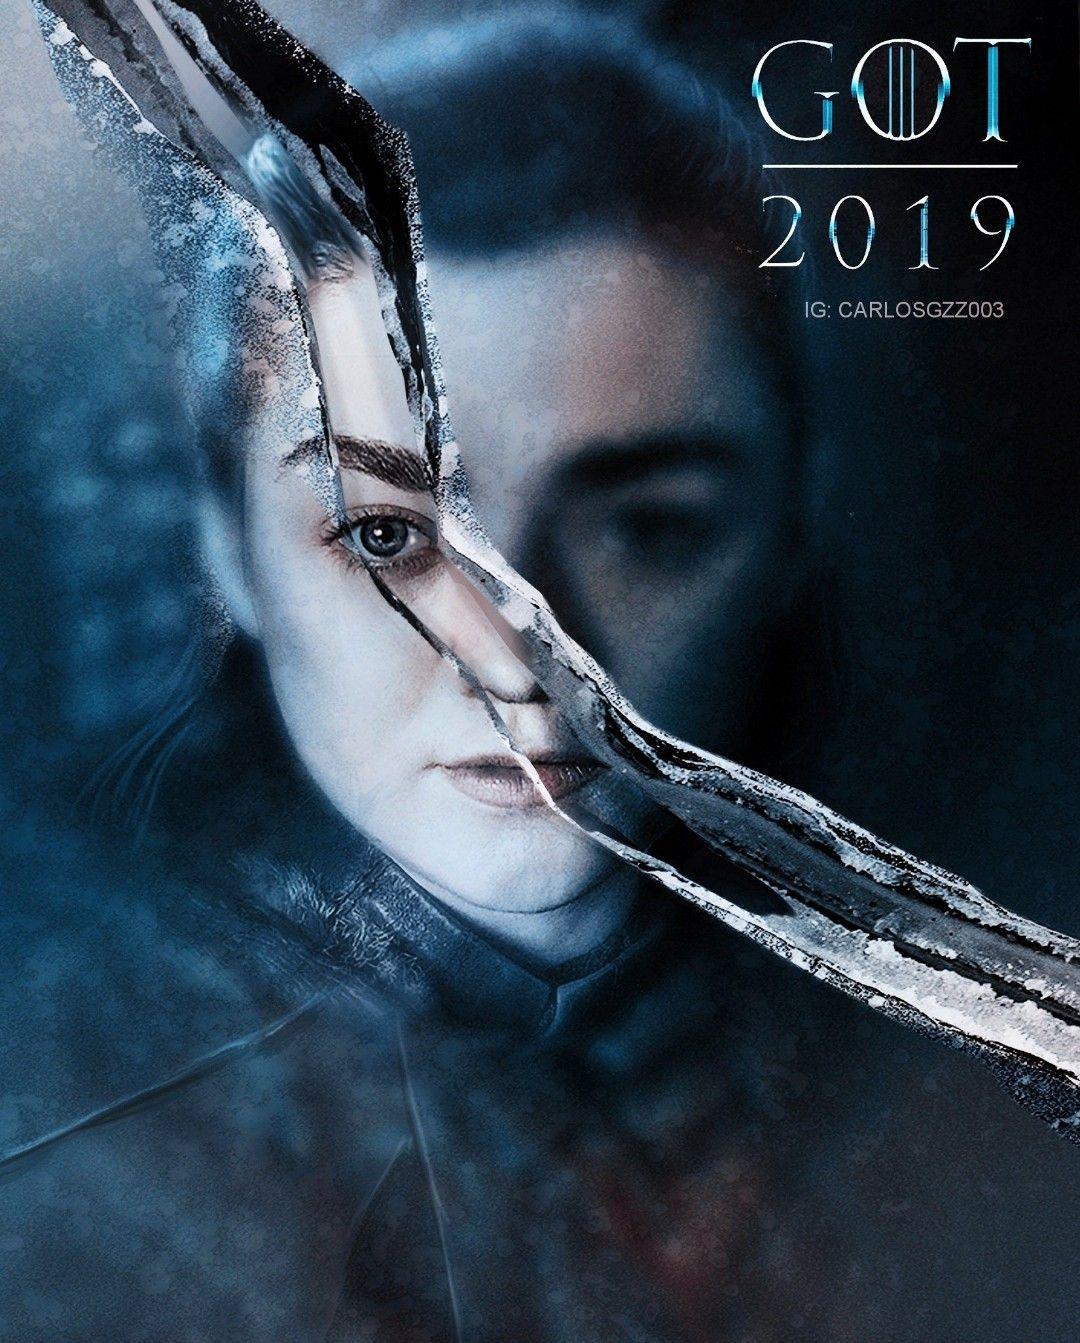 The End Arya Stark With Images Arya Stark Poster Artwork